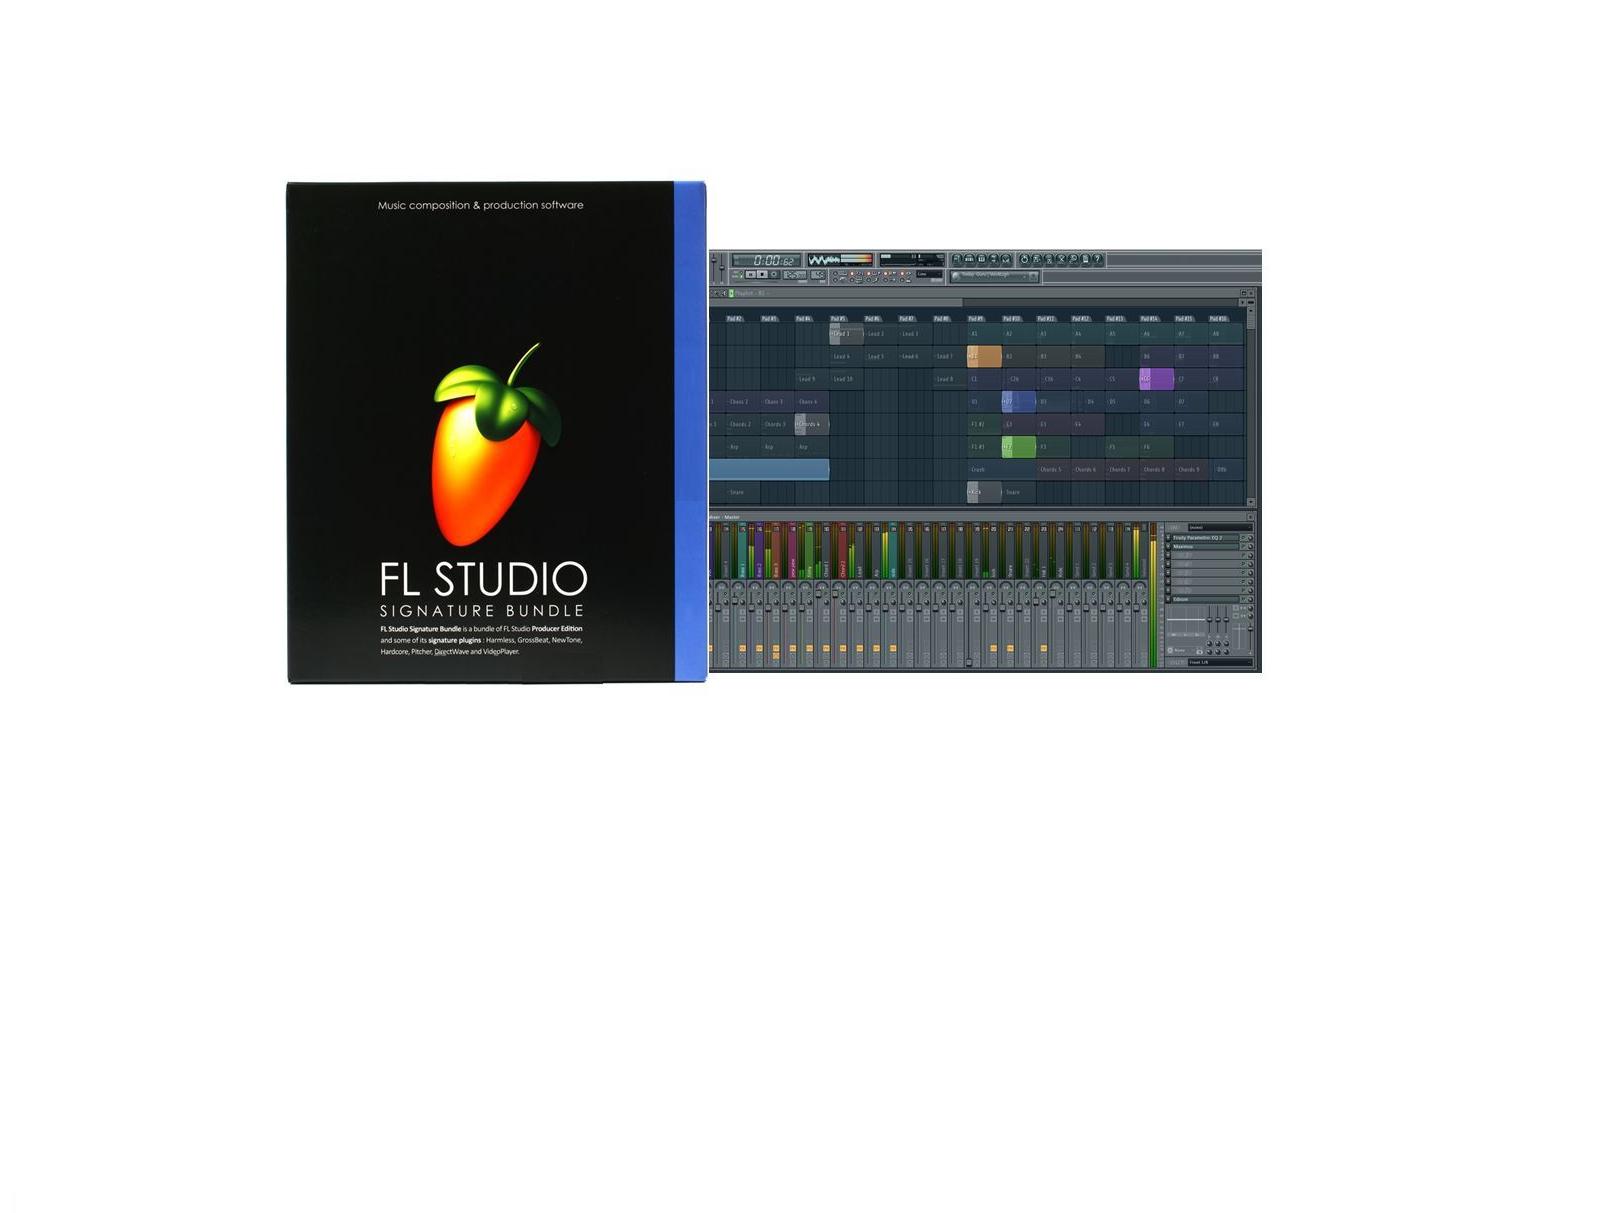 FL STUDIO 20 FRUITY LOOPS SIGNATURE MUSIC SOFTWARE RETAIL WINDOWS 7 8 10 LICENSE